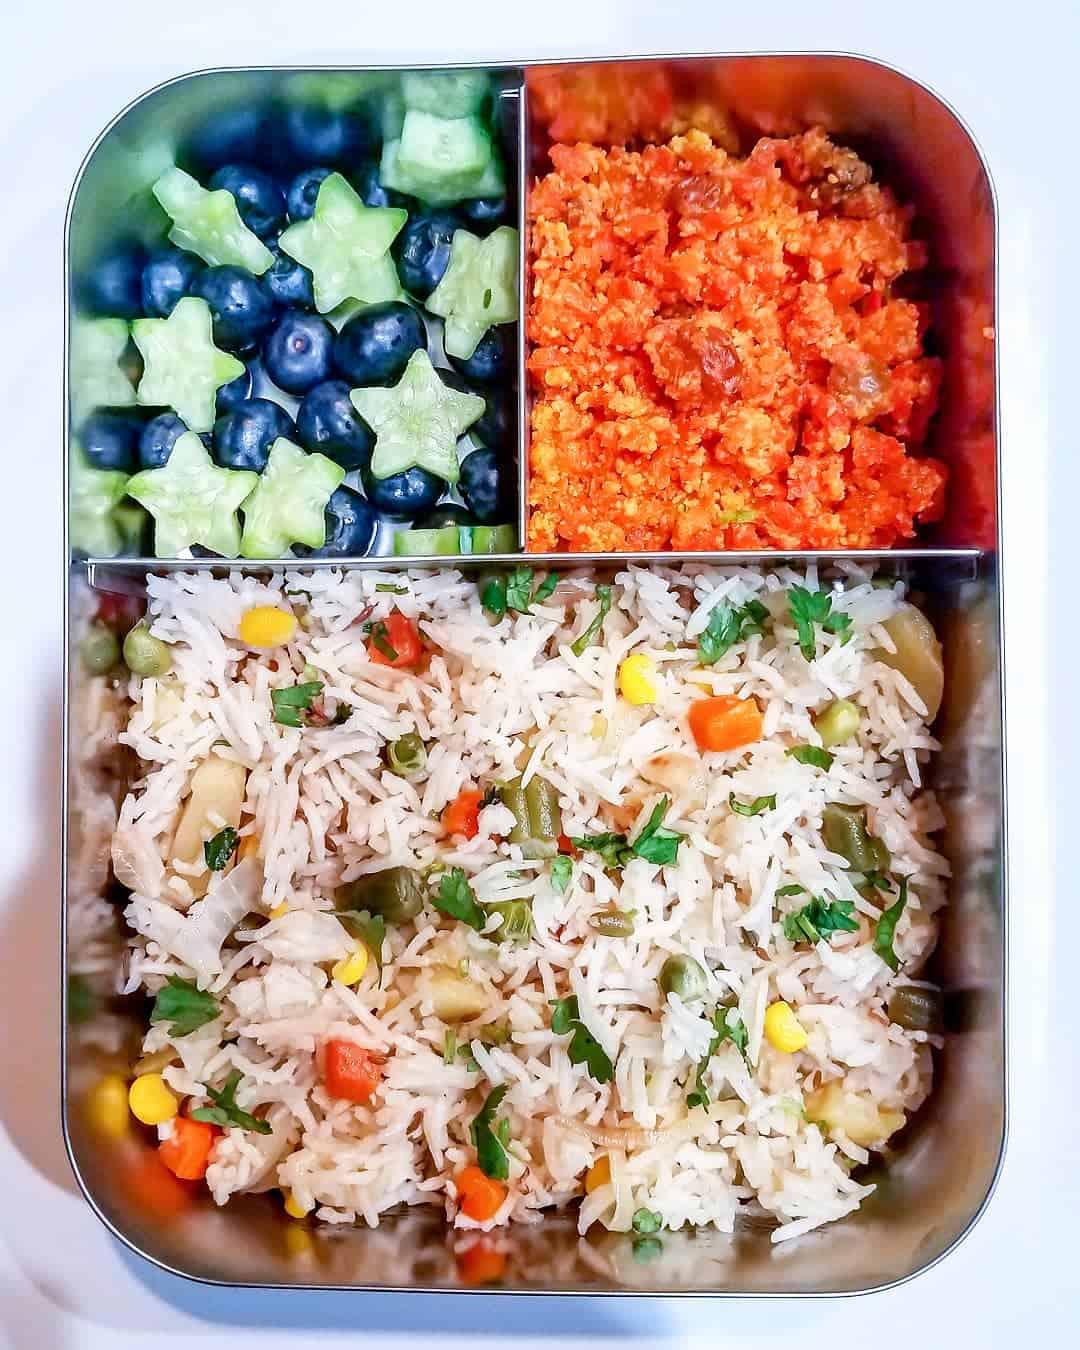 Mix veg pulao , Gajar ka halwa (carrot pudding), Blueberries and cucumber stars